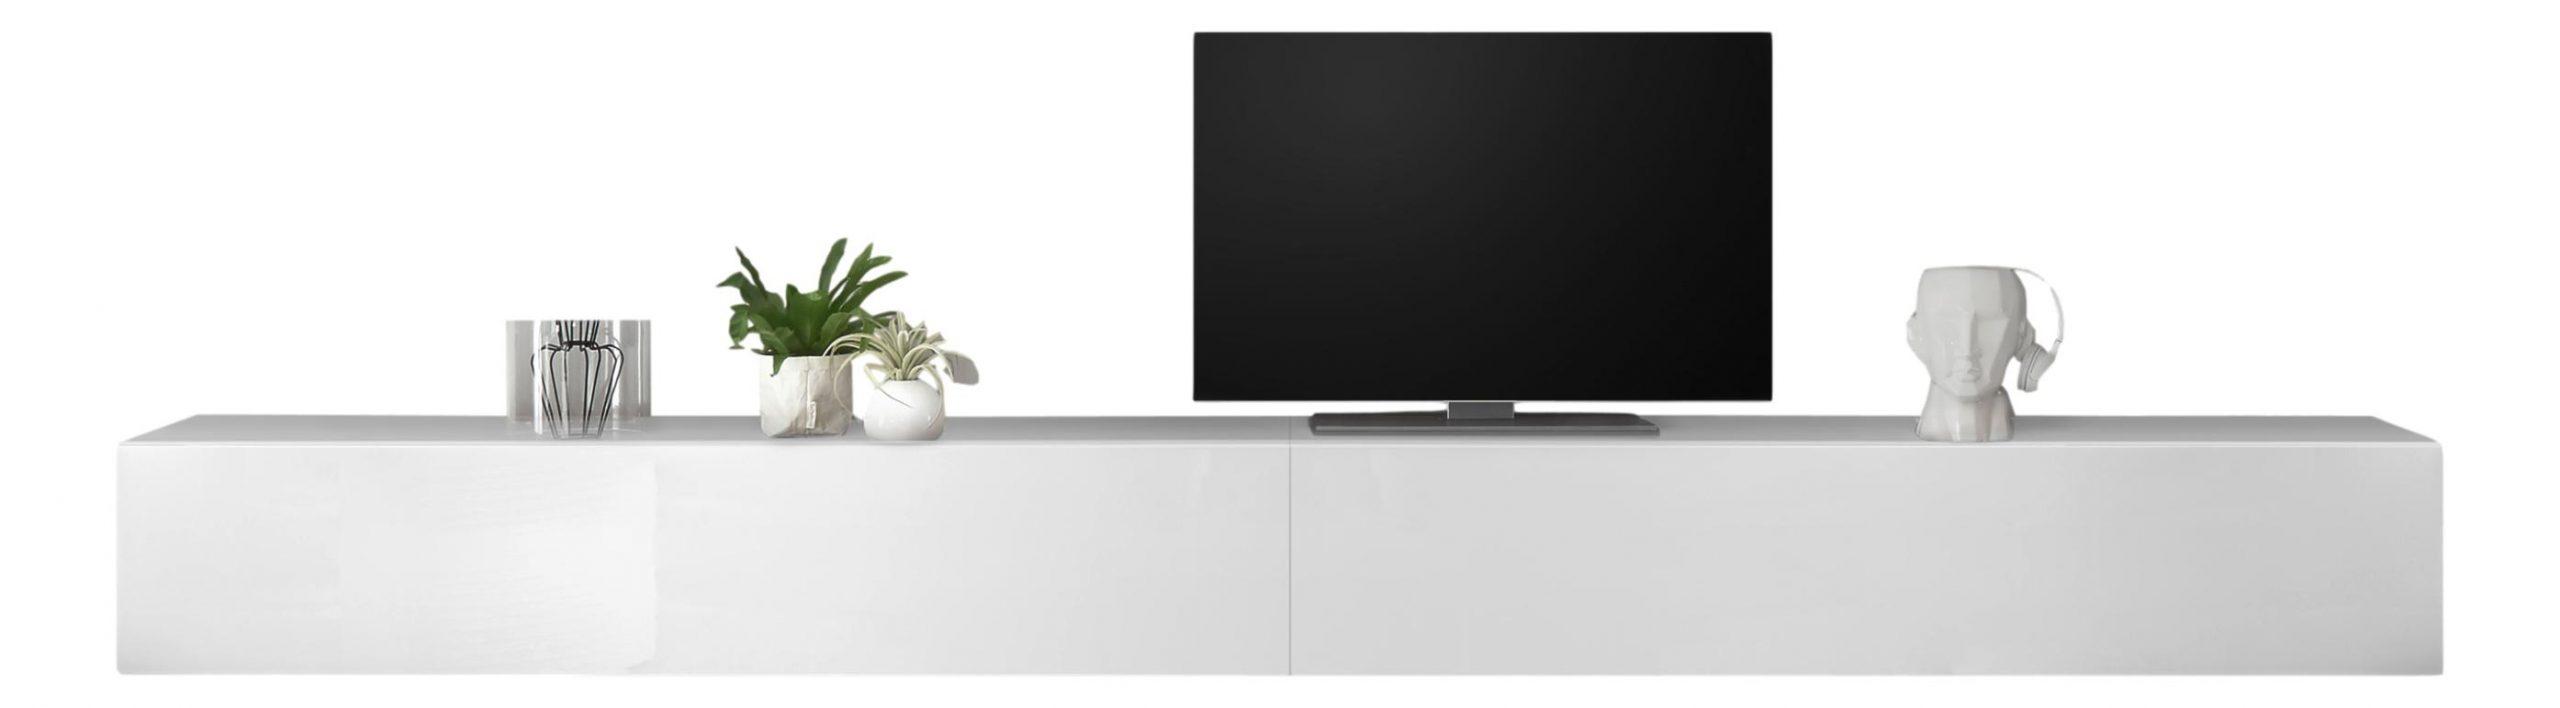 Zwevend Tv-meubel Tesla 276 cm breed in hoogglans wit | Pesaro Mobilia